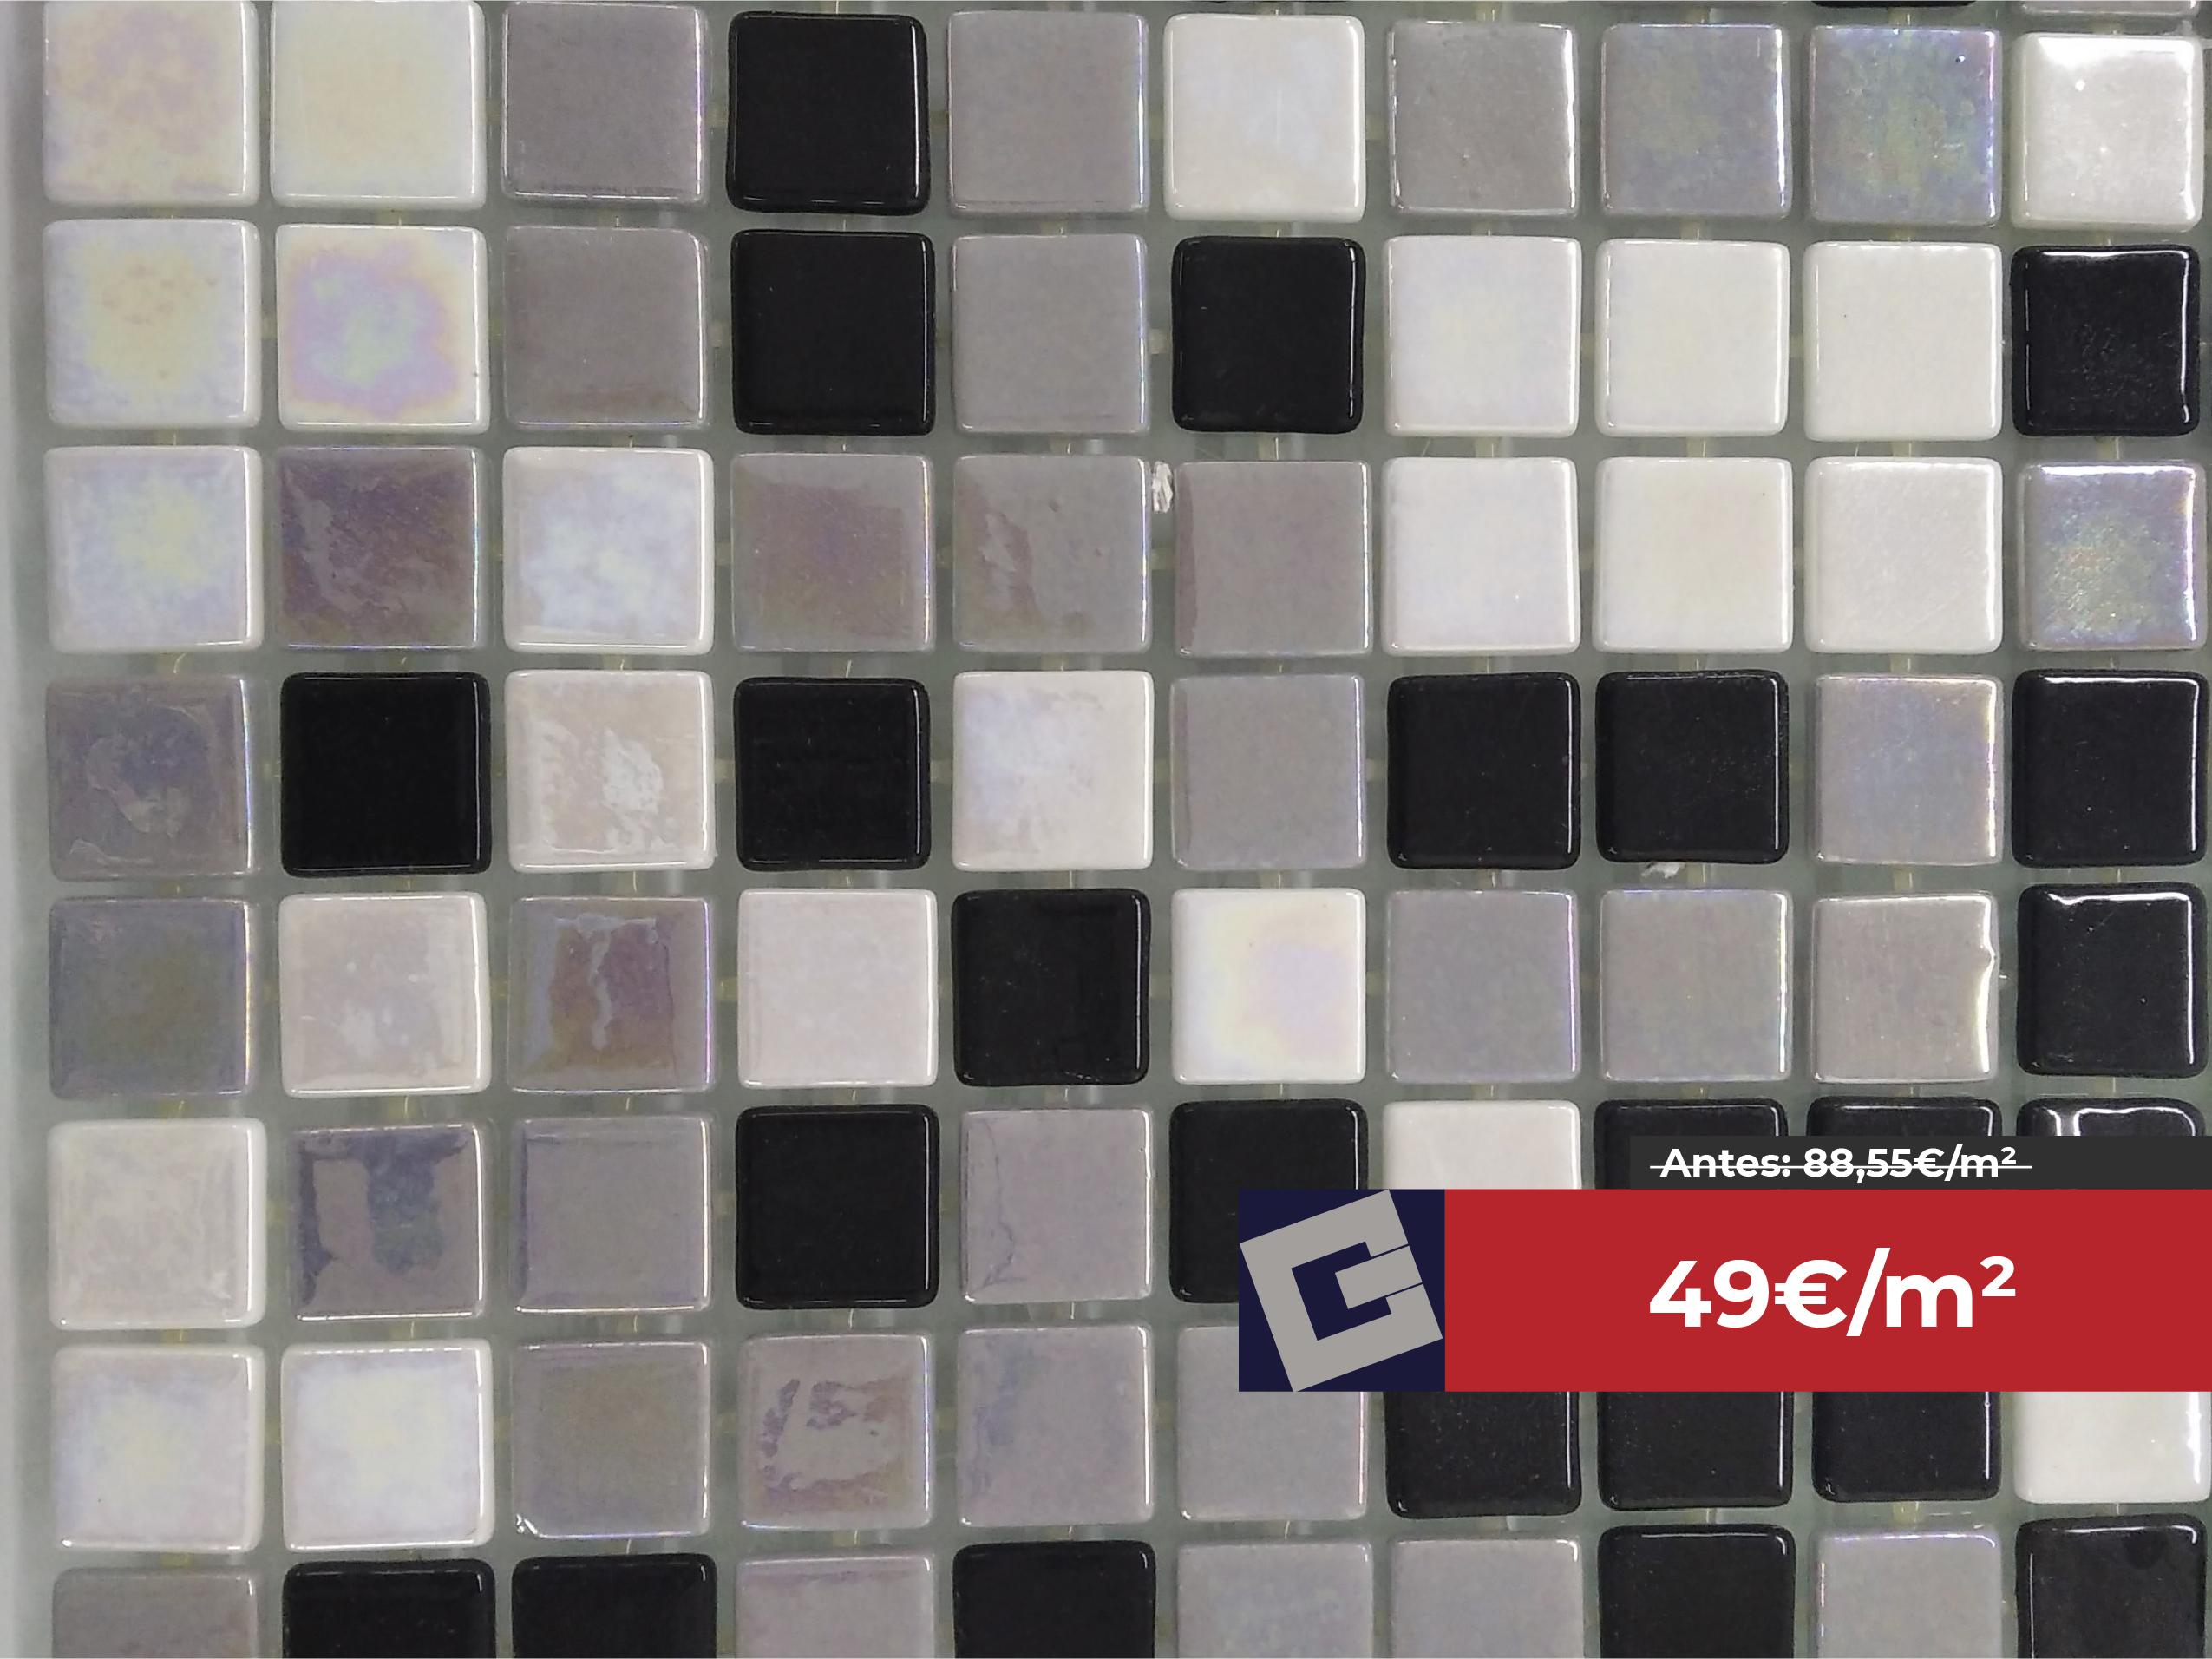 Gresite mix Togama gris-blanco-negro 2,5×2,5cm